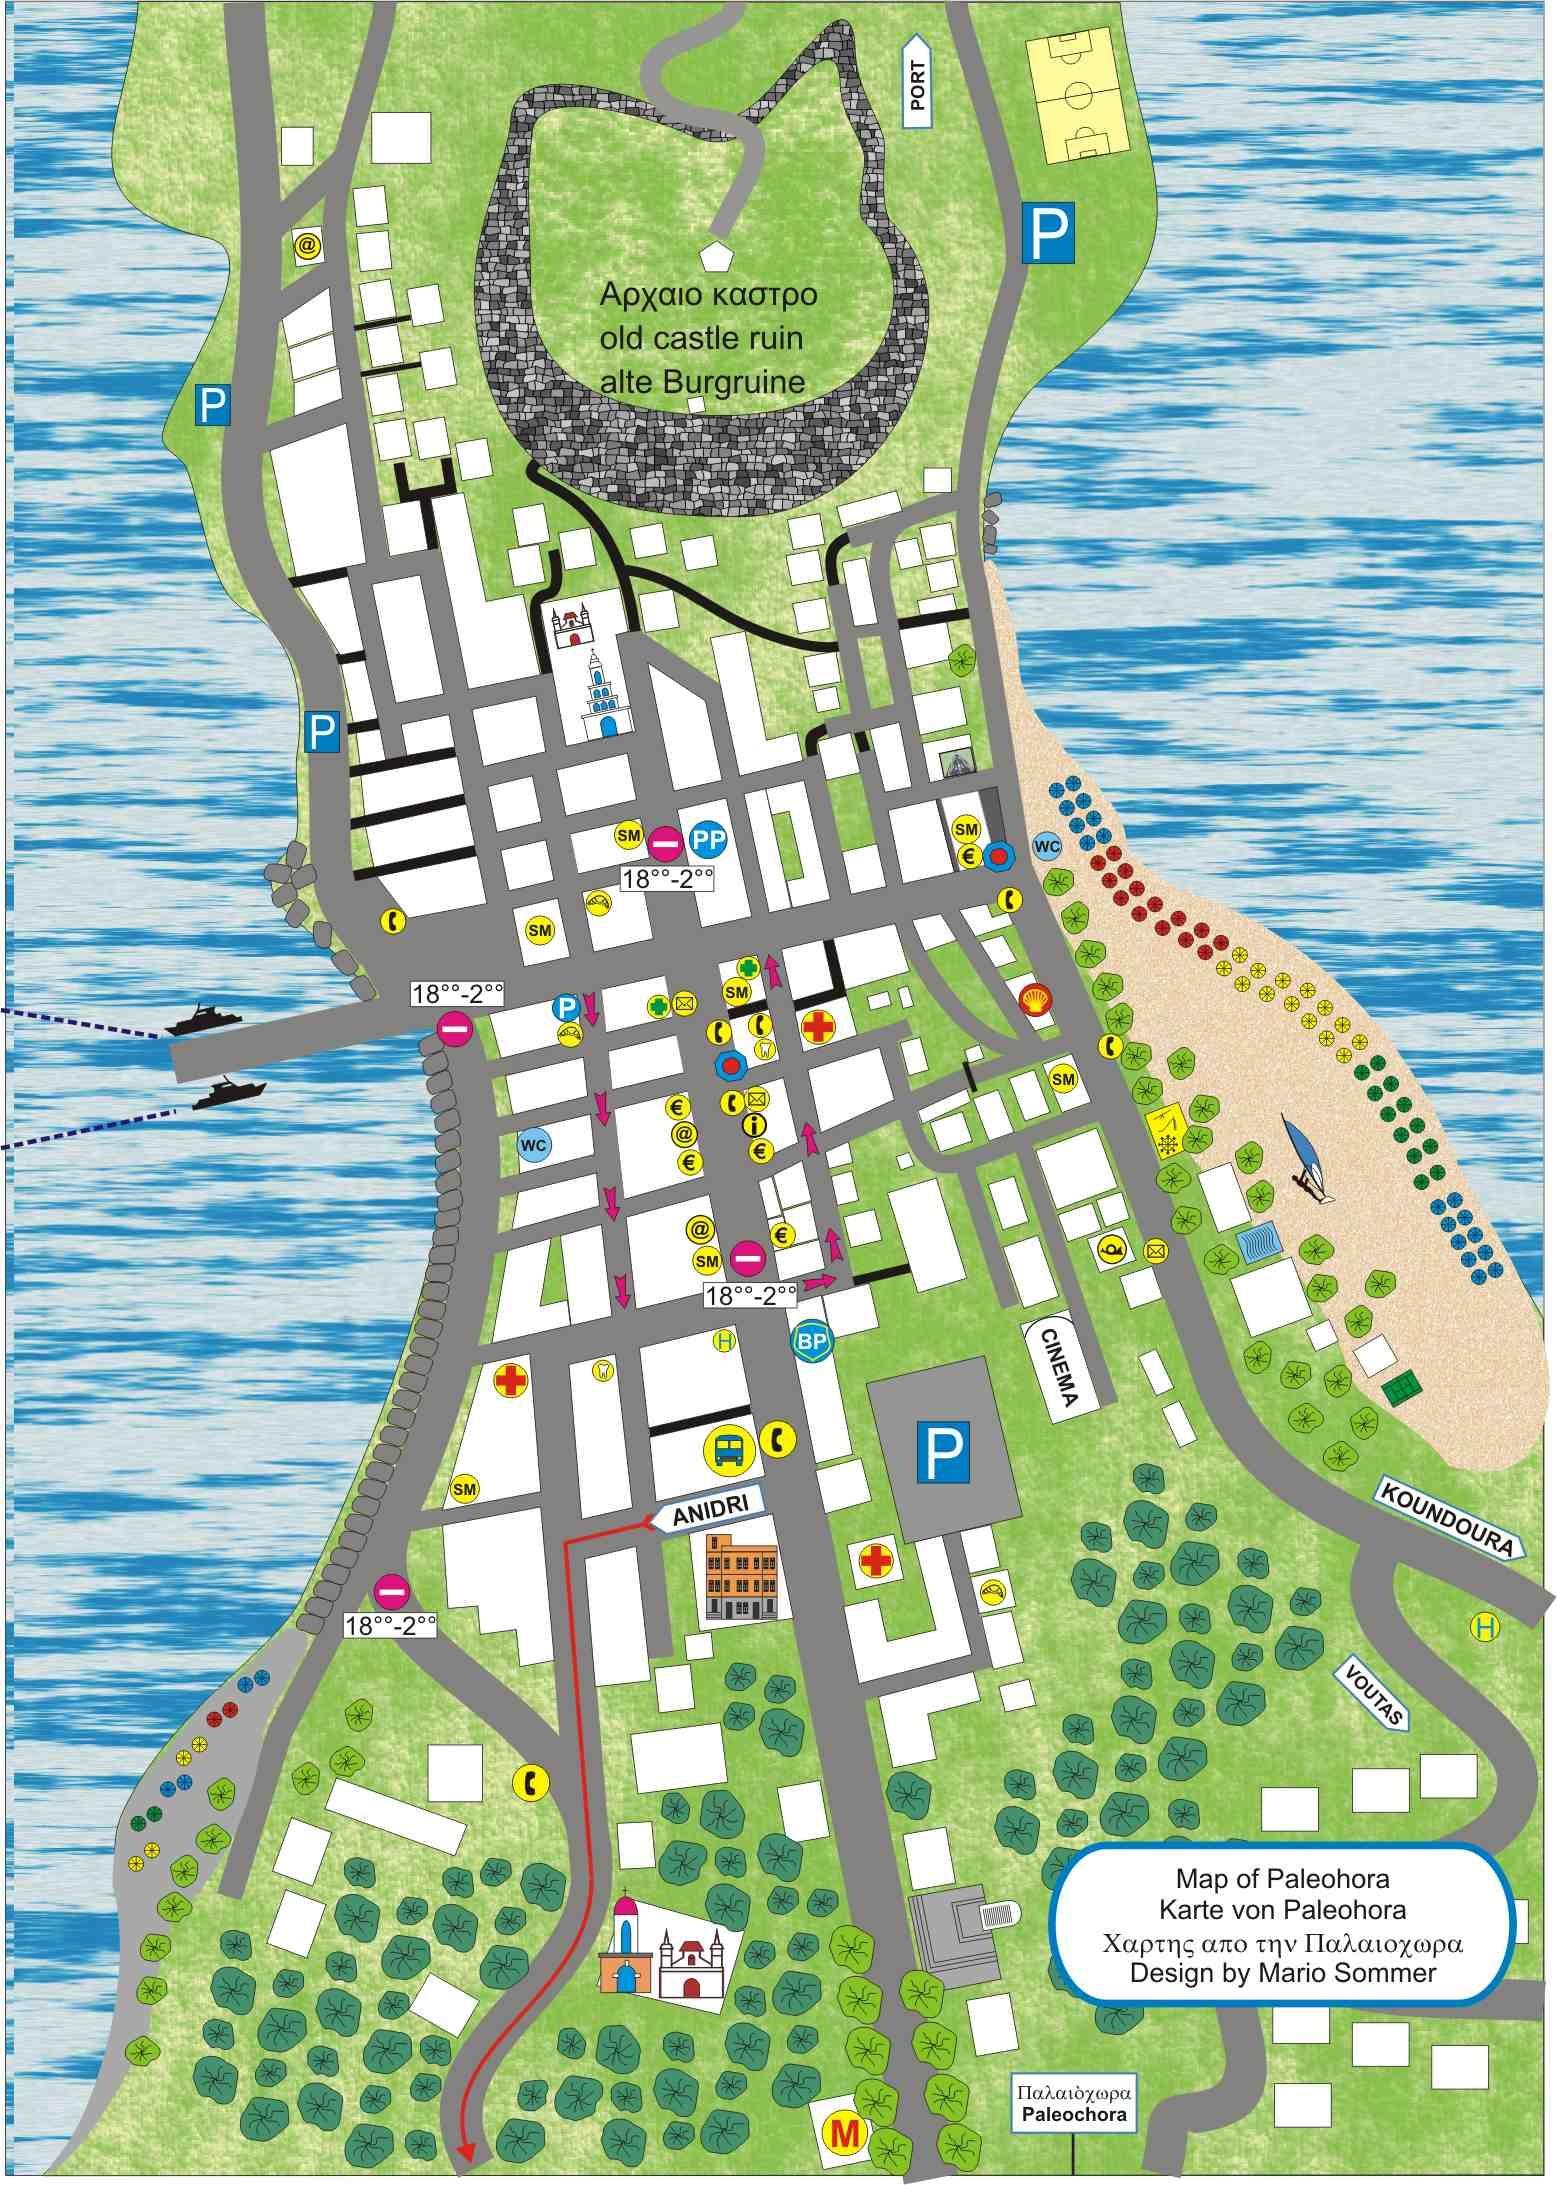 Paleochora Karte